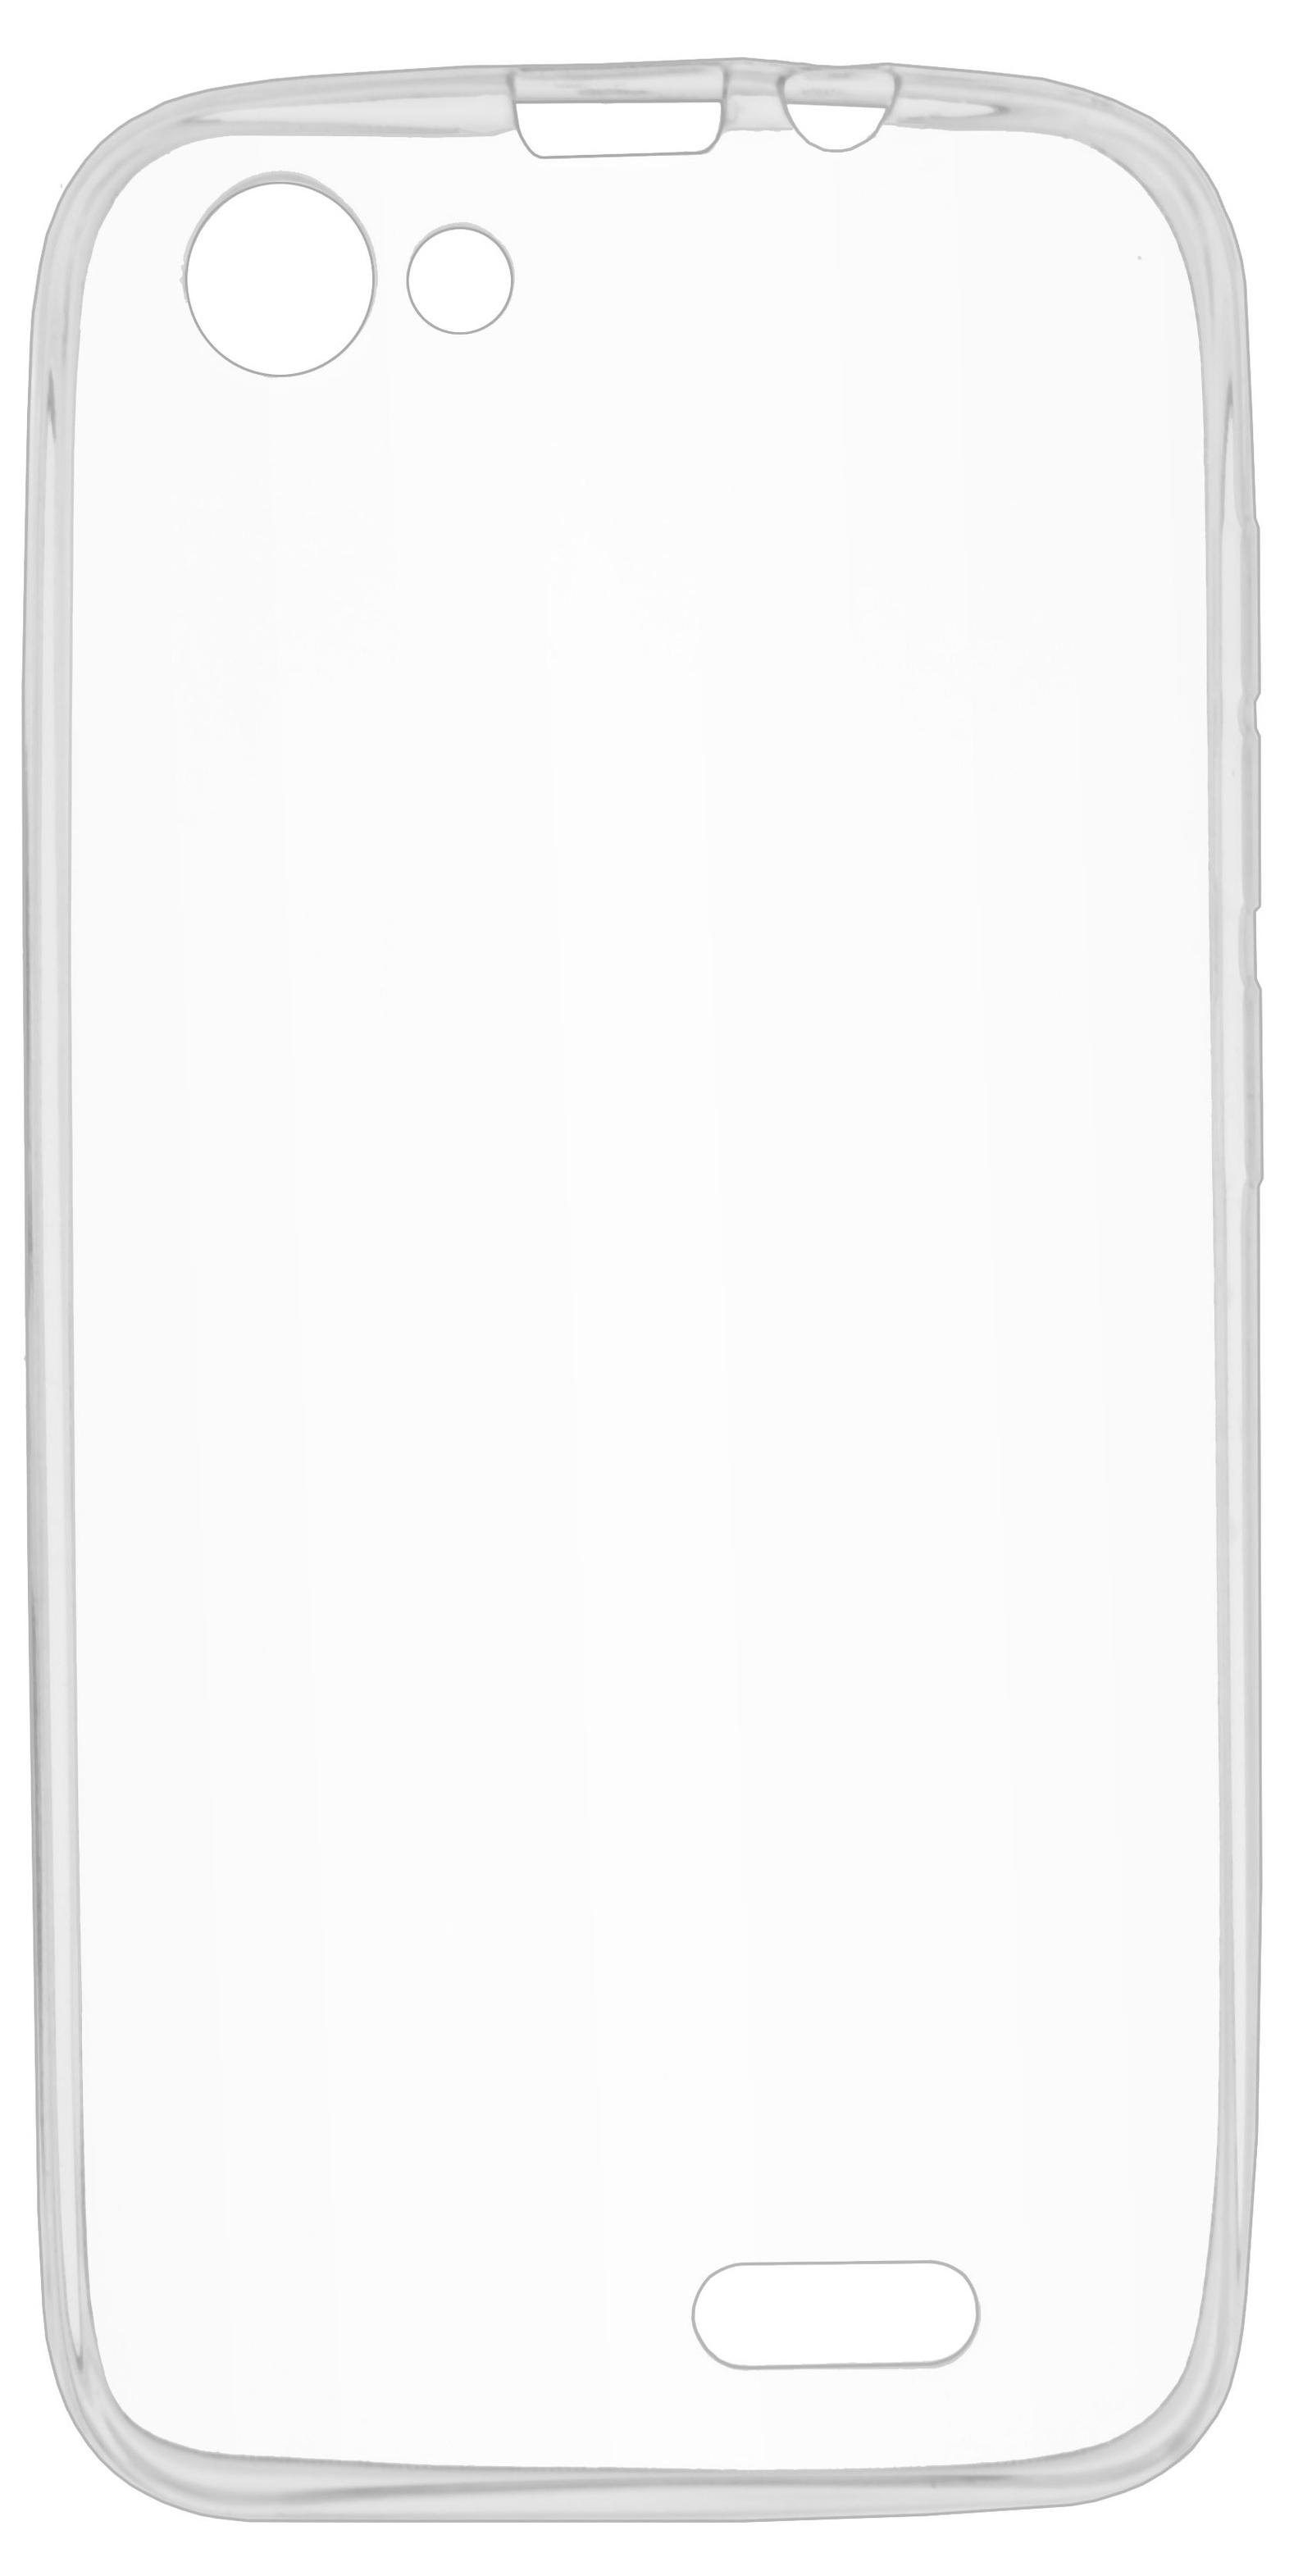 Чехол для сотового телефона skinBOX Slim Silicone, 4630042521599, прозрачный чехол для xiaomi redmi pro skinbox 4people slim silicone case прозрачный